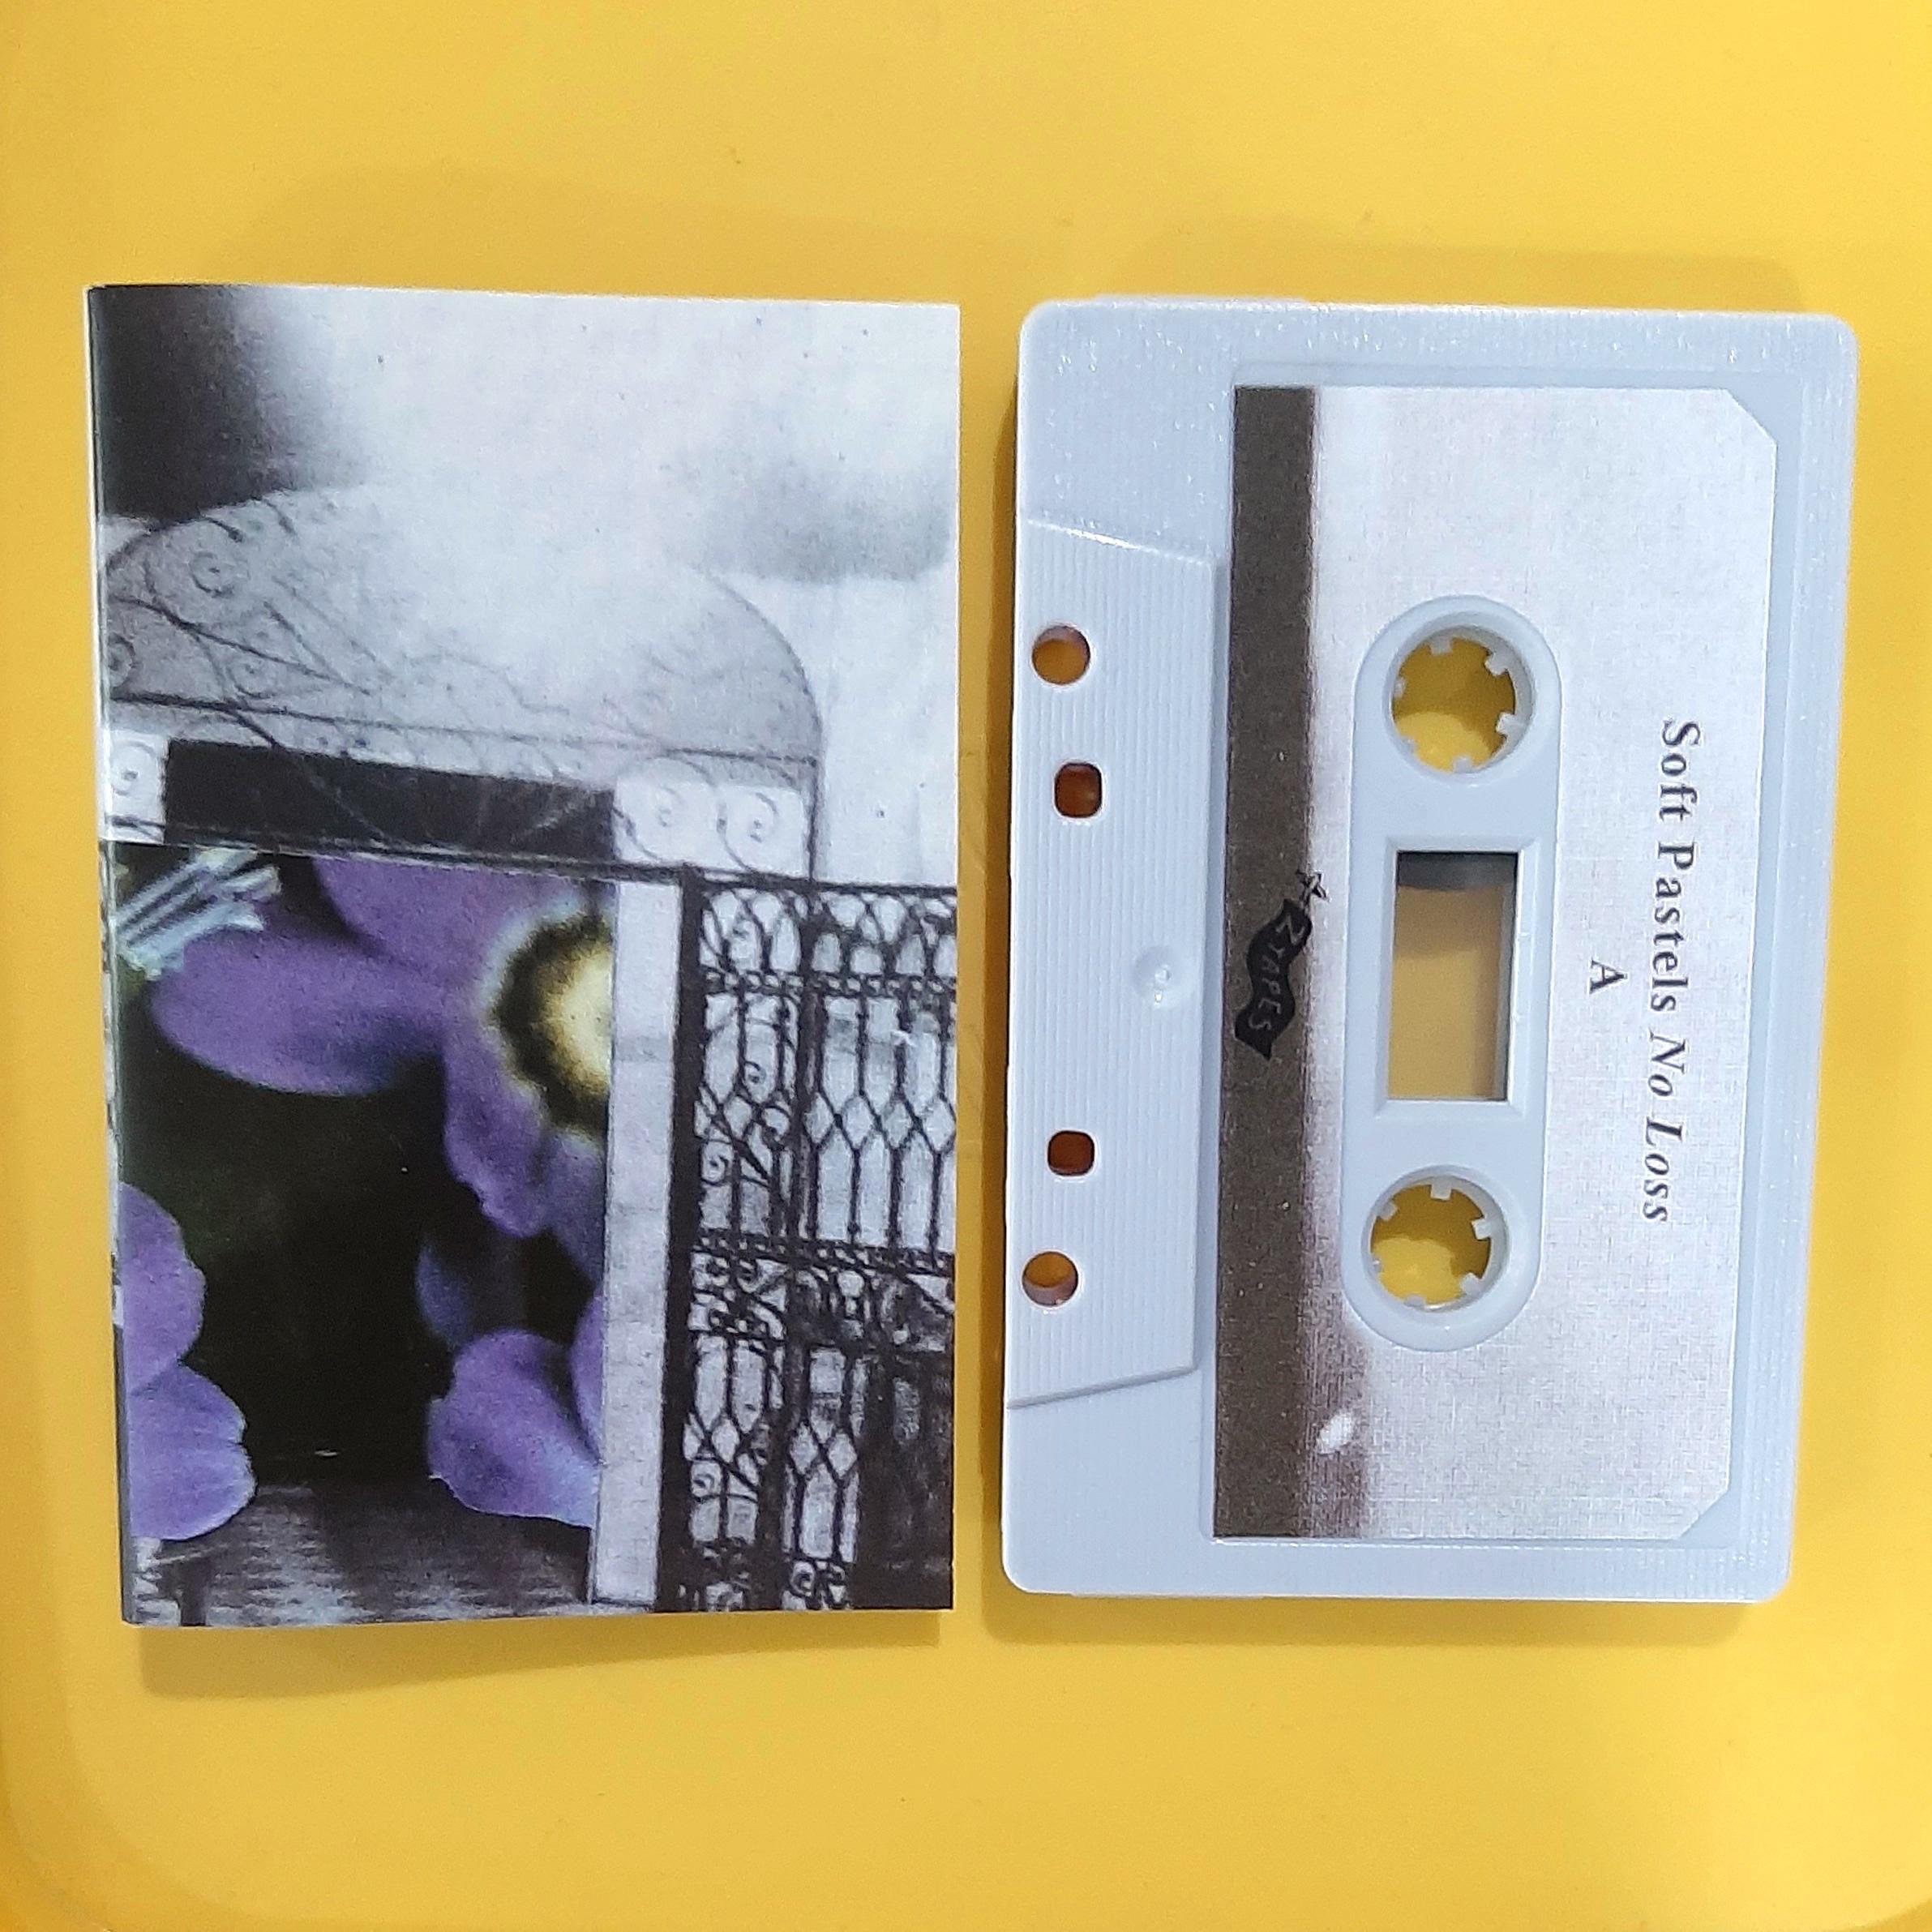 Soft Pastels - No Loss (Z Tapes)